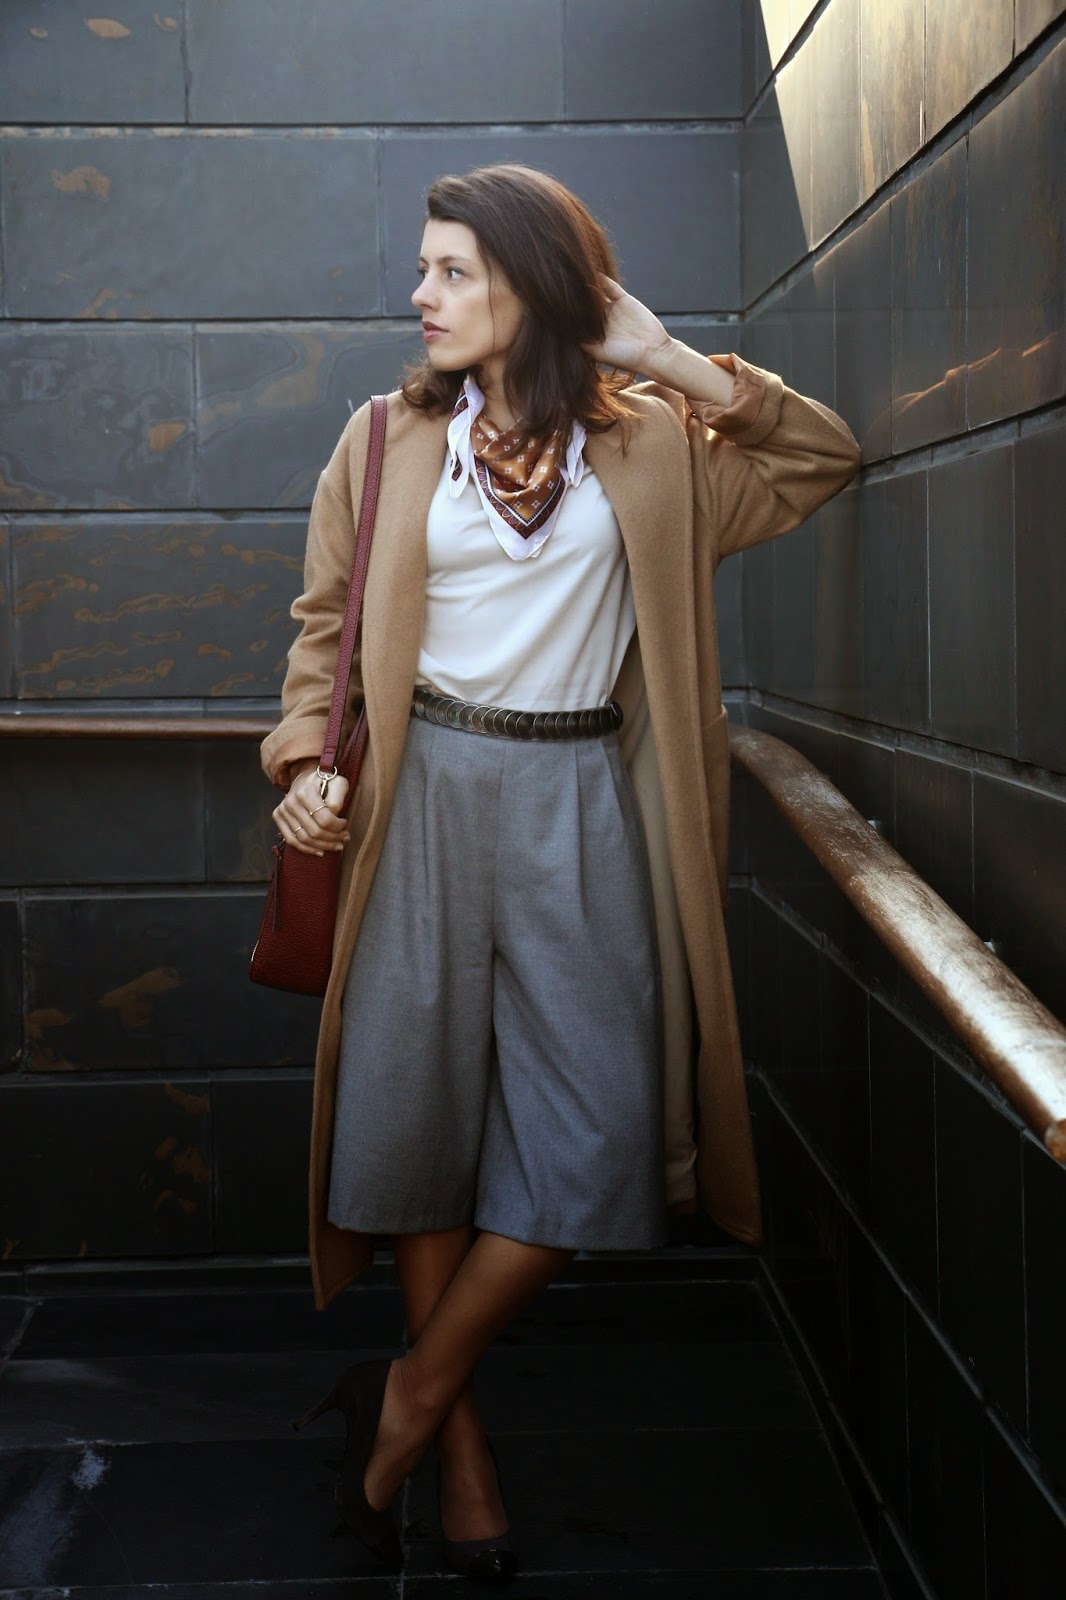 http://ilovefitametrica.blogspot.pt/2015/01/grey-culottes.html